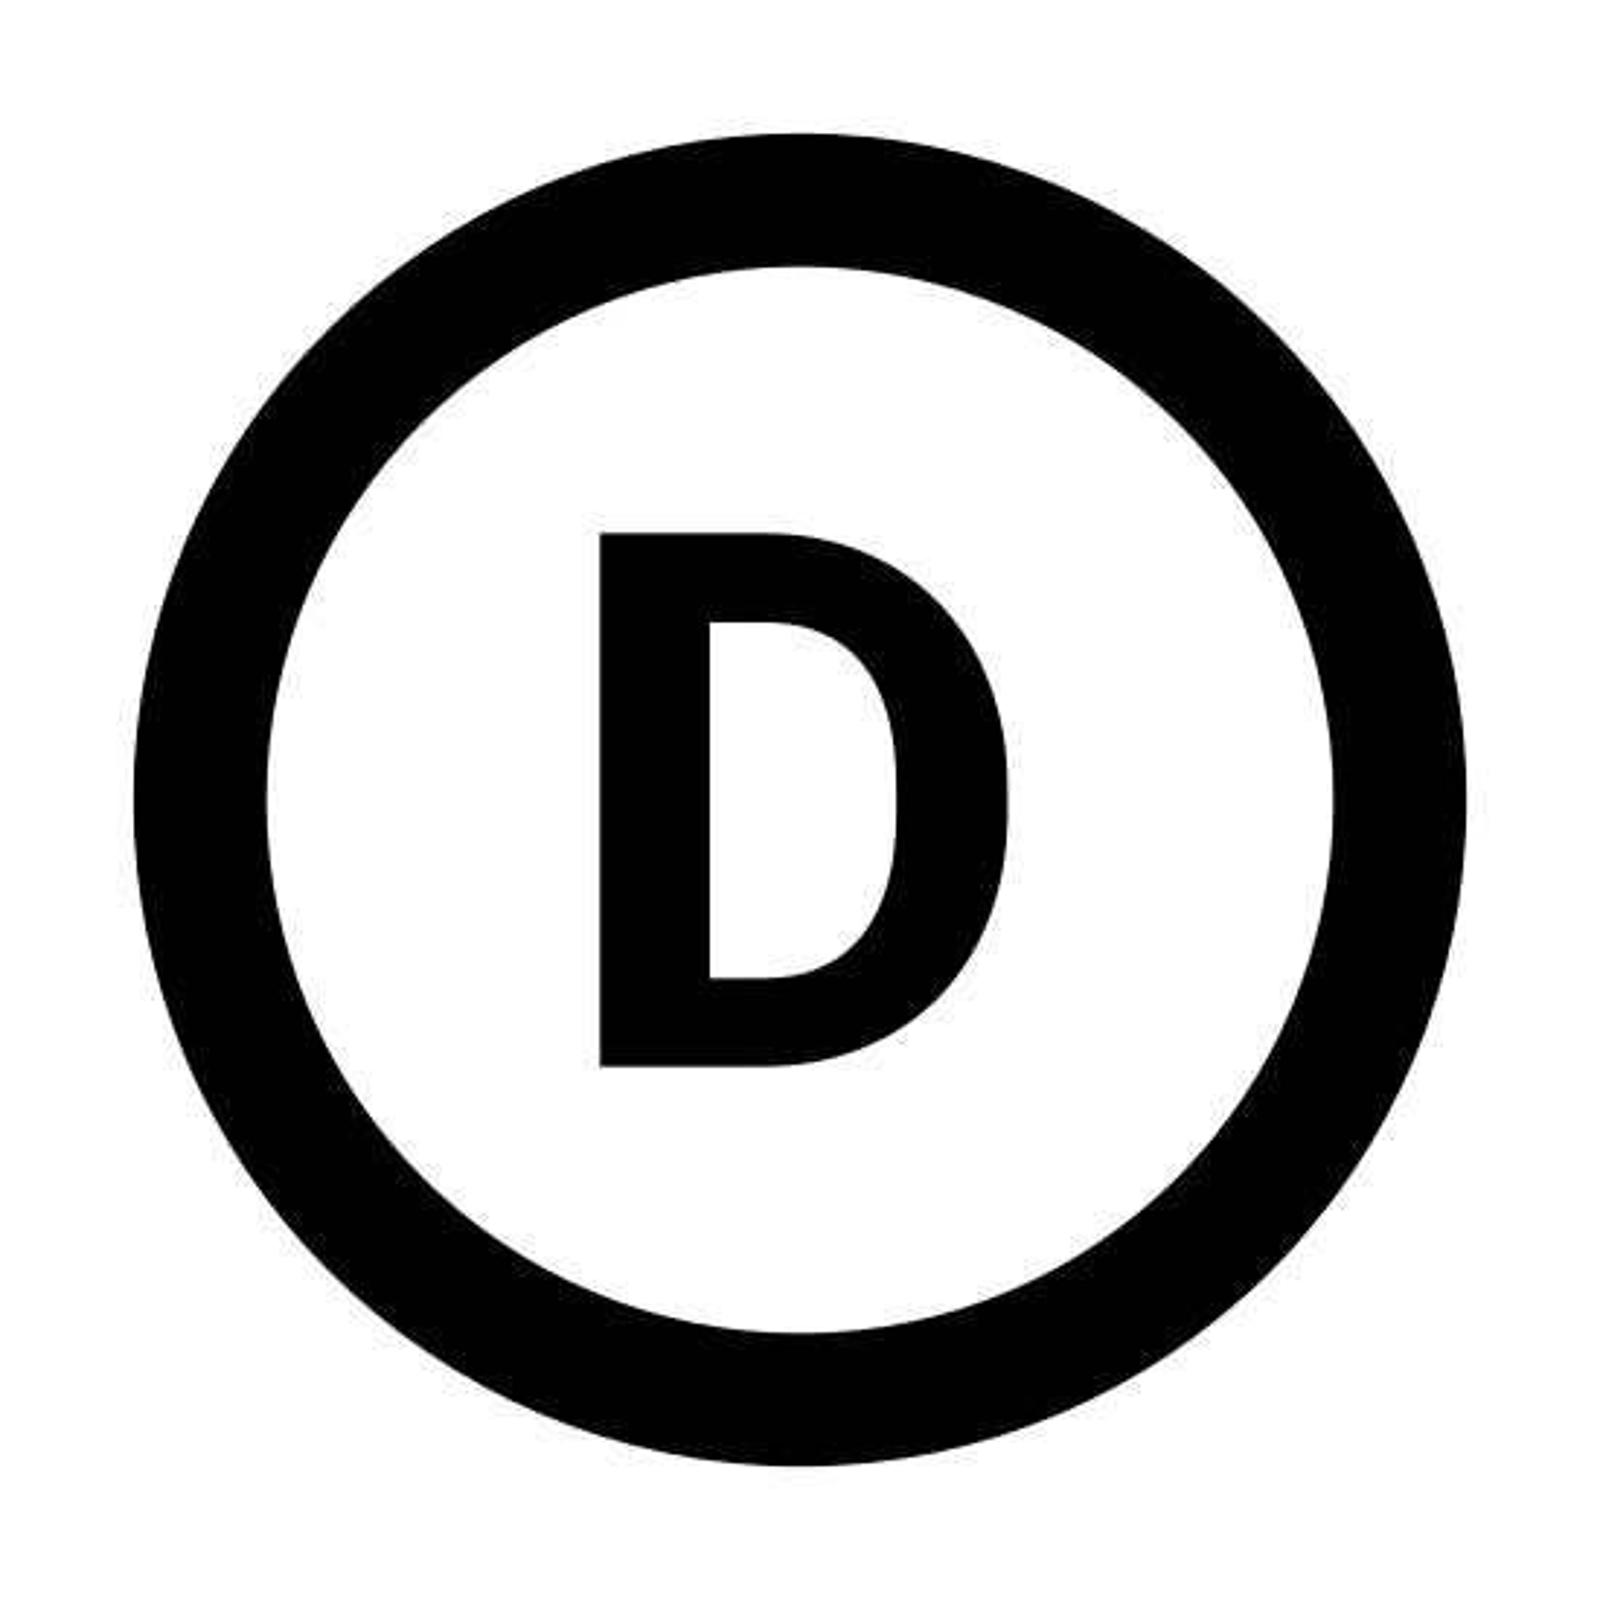 Circled D icon